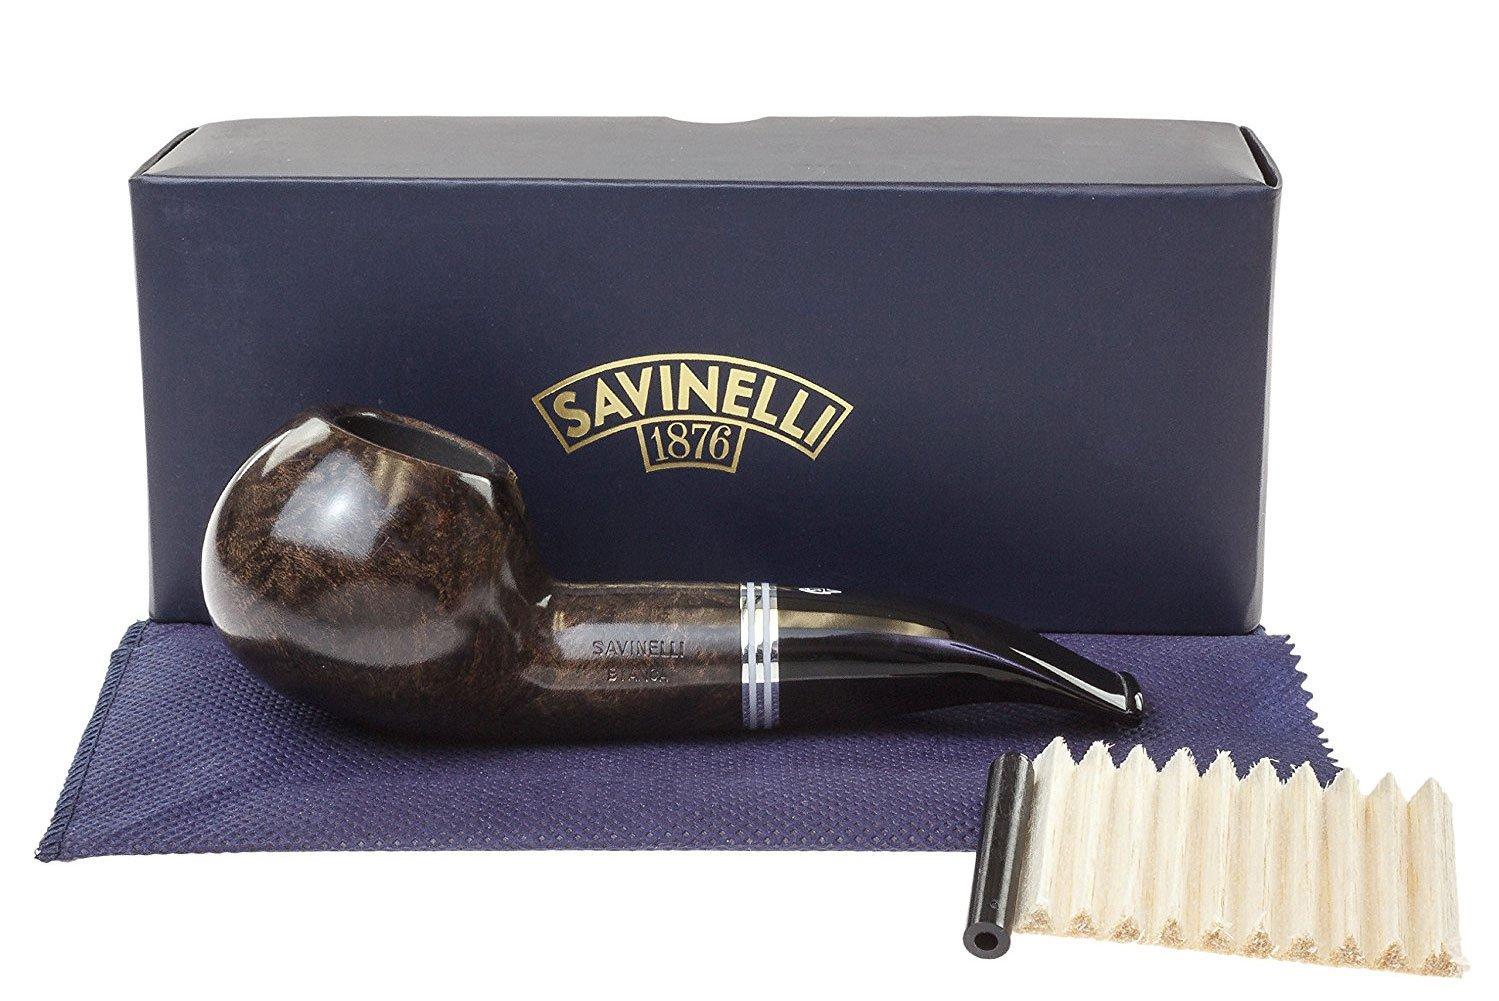 Savinelli Italian Tobacco Smoking Pipes, Bianca Smooth 320 KS